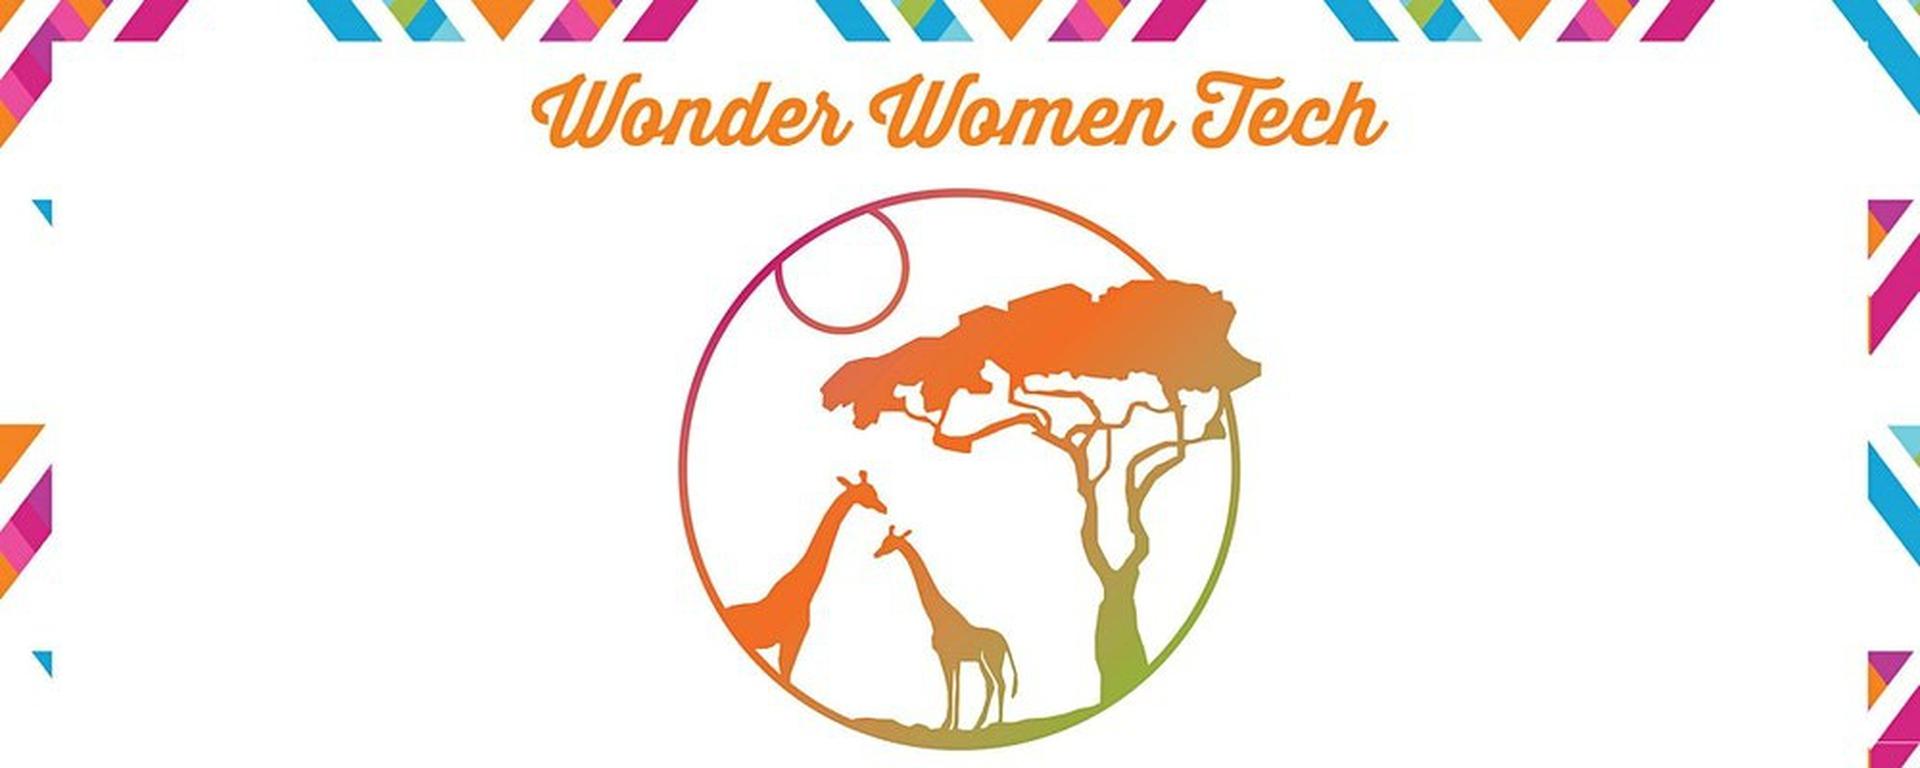 Wonder Women Tech - Africa Virtual Summit 2021 Movemeback African event cover image